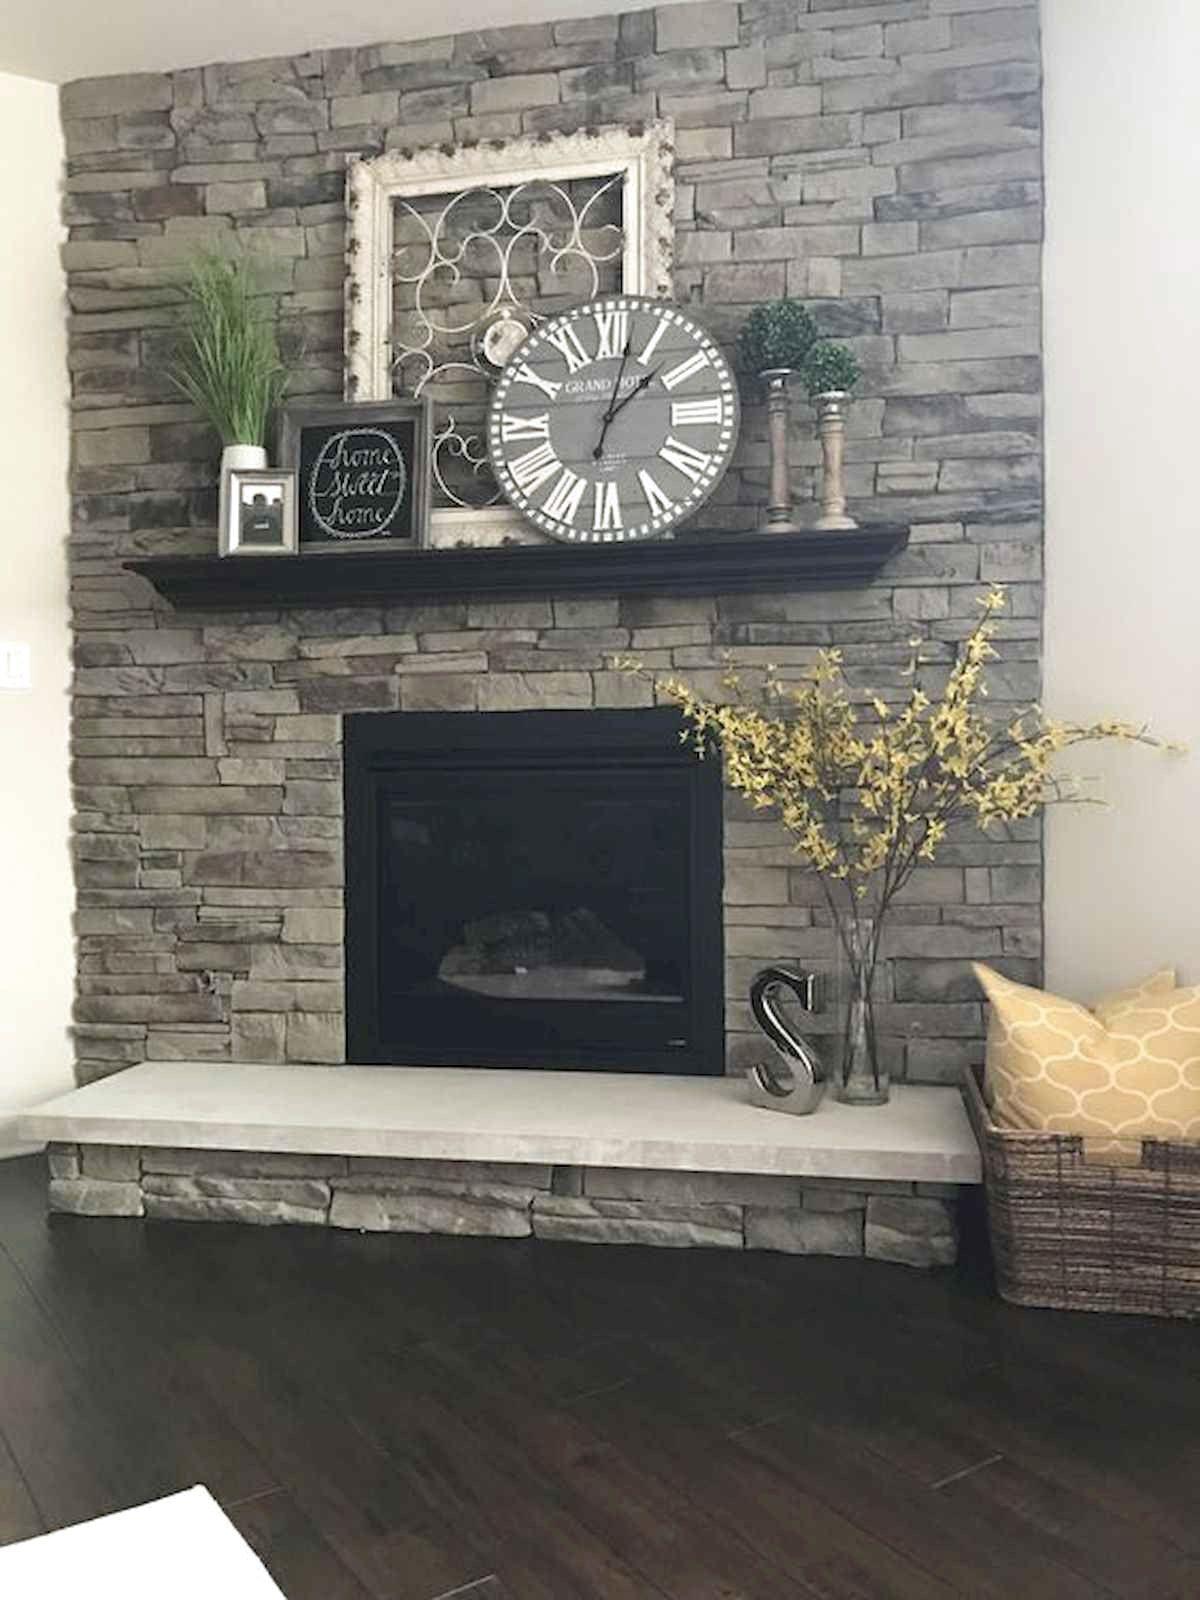 Best Modern Farmhouse Fireplace Mantel Decor Ideas In 2020 Farmhouse Fireplace Decor Brick Fireplace Makeover Fireplace Mantel Decor